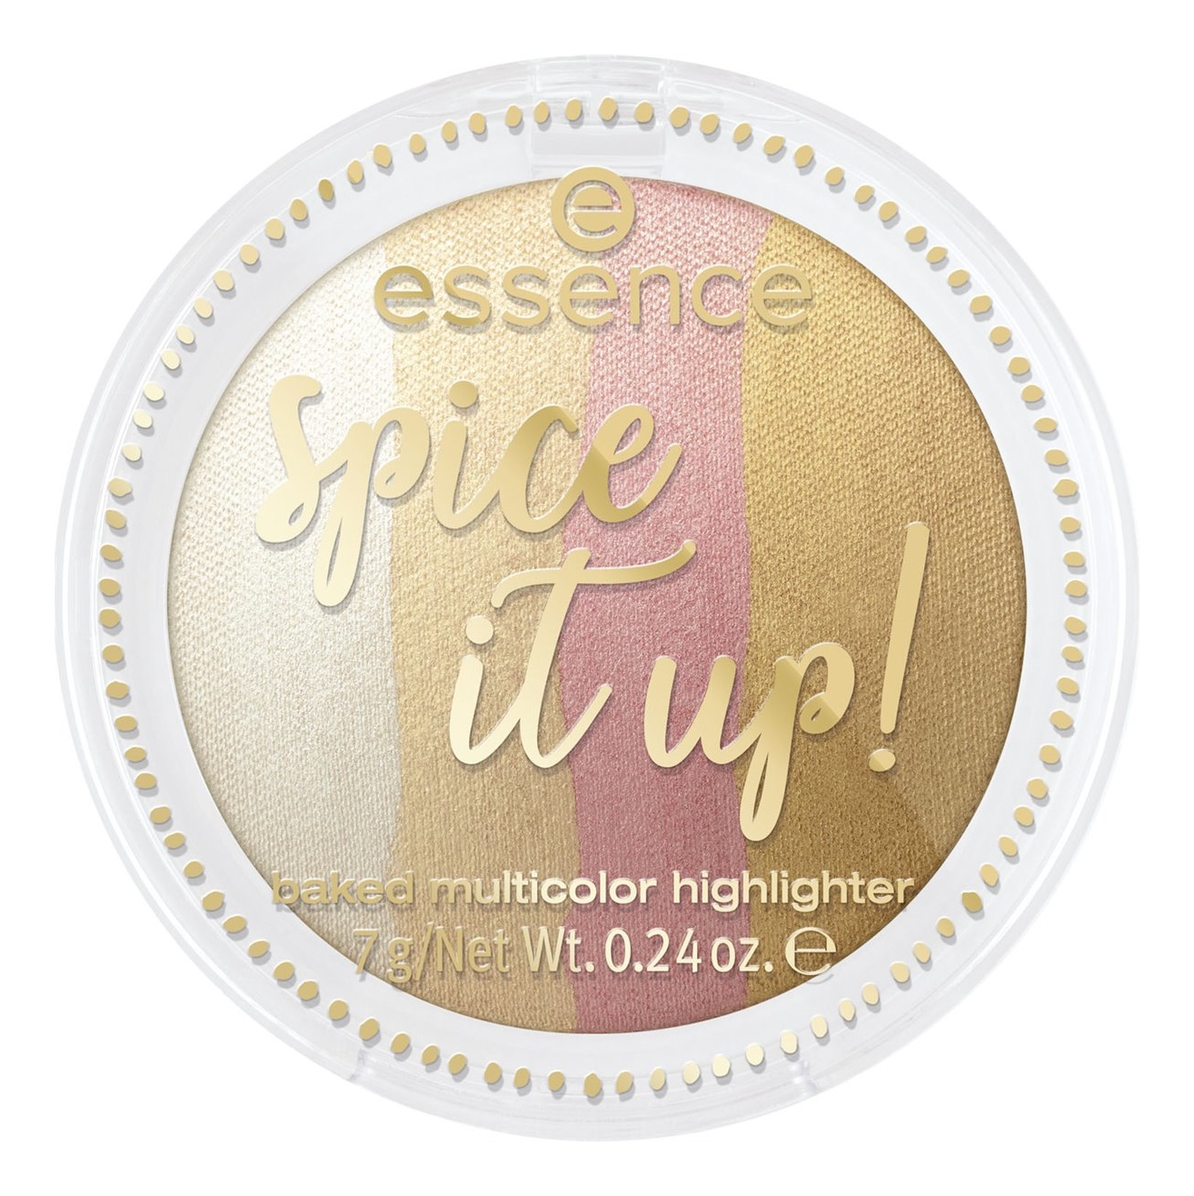 Хайлайтер для лица Spice It Up! Baked Multicolor Highlighter 7г